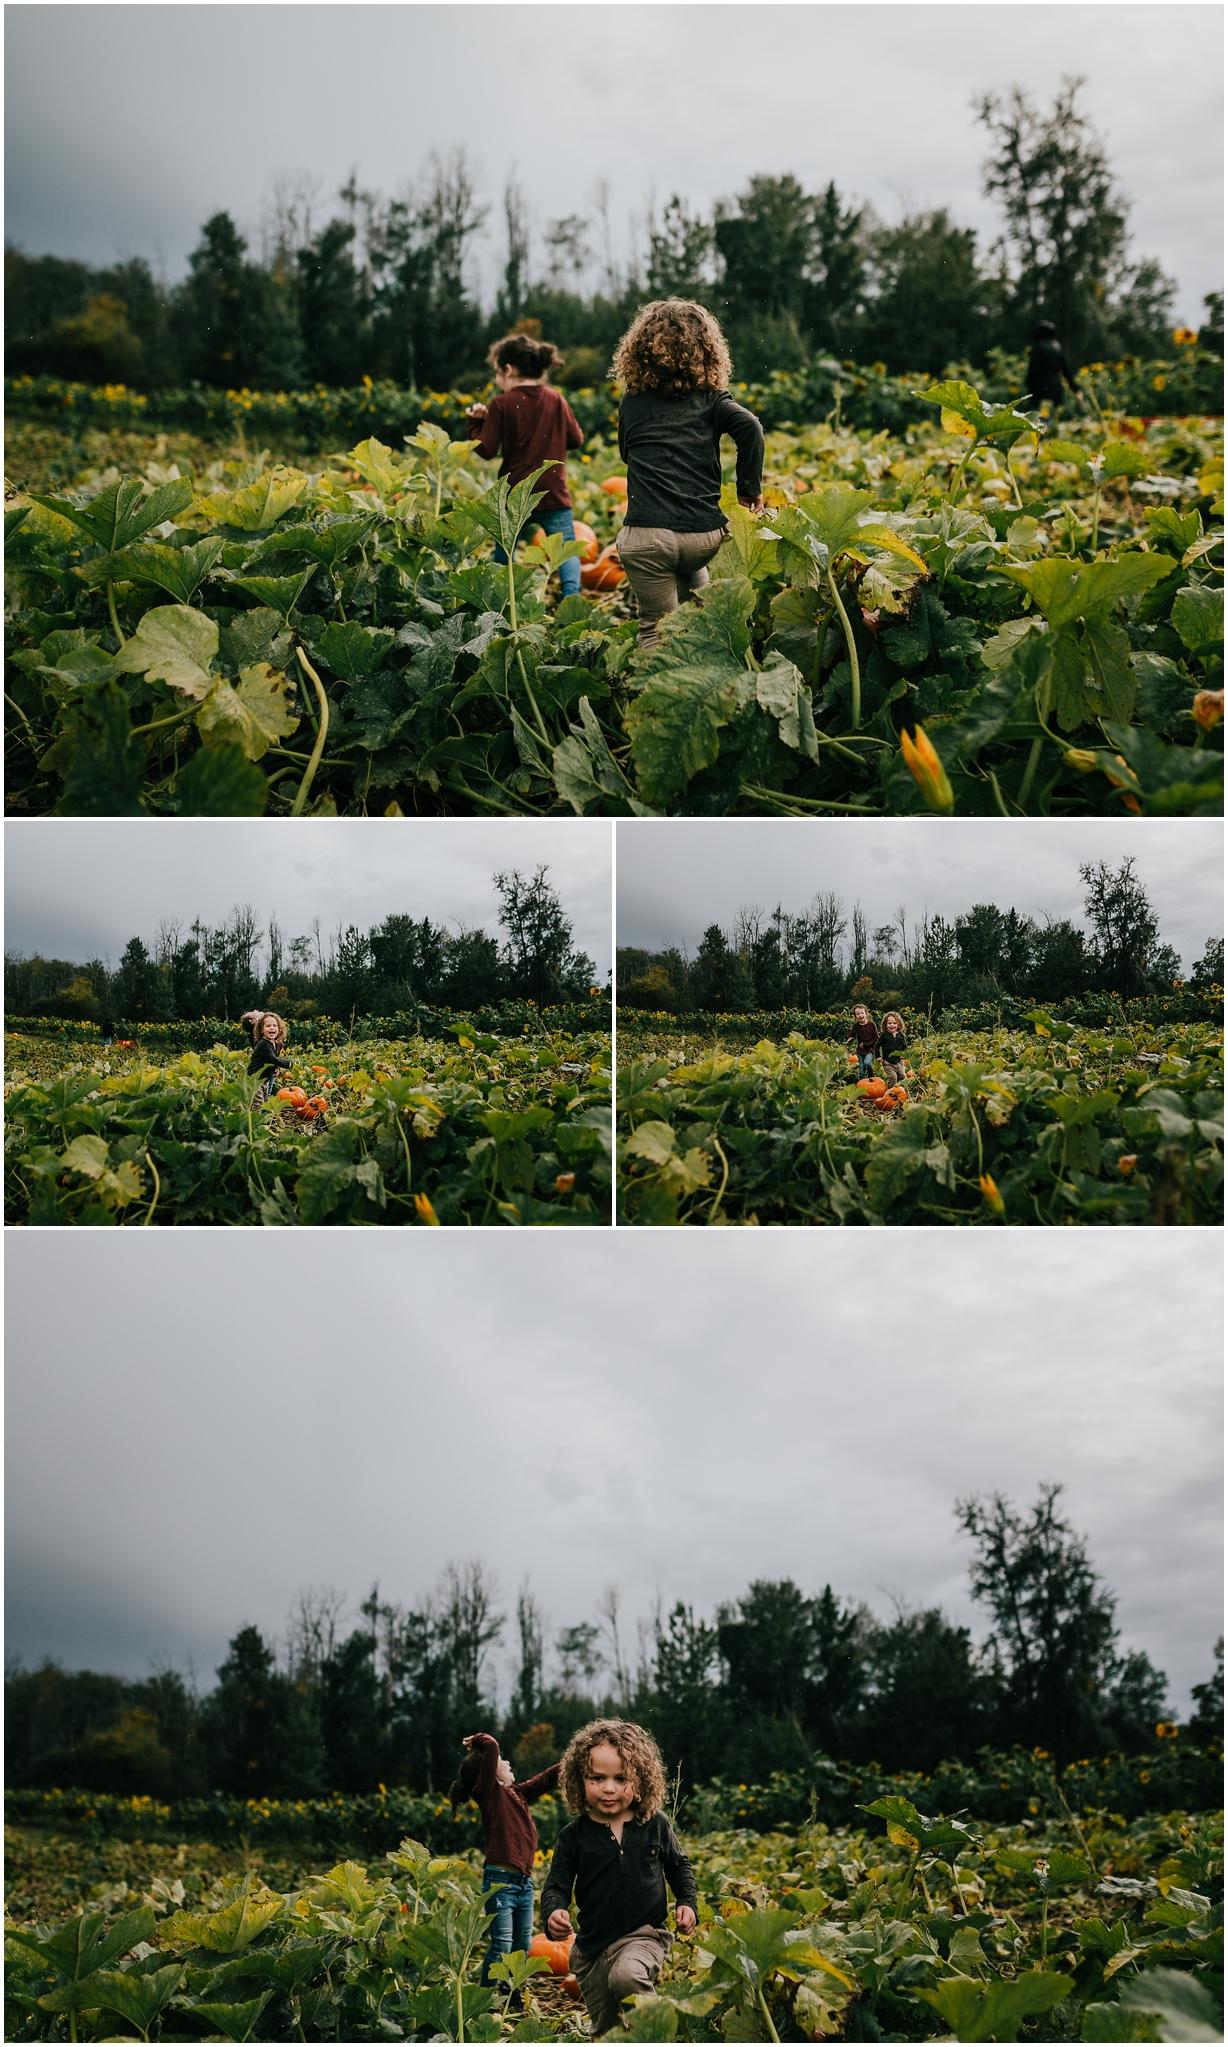 Treelines Photography - Edmonton Family Photographer - Lifestyle Photography - Somerset Farms Pumpkin Picking